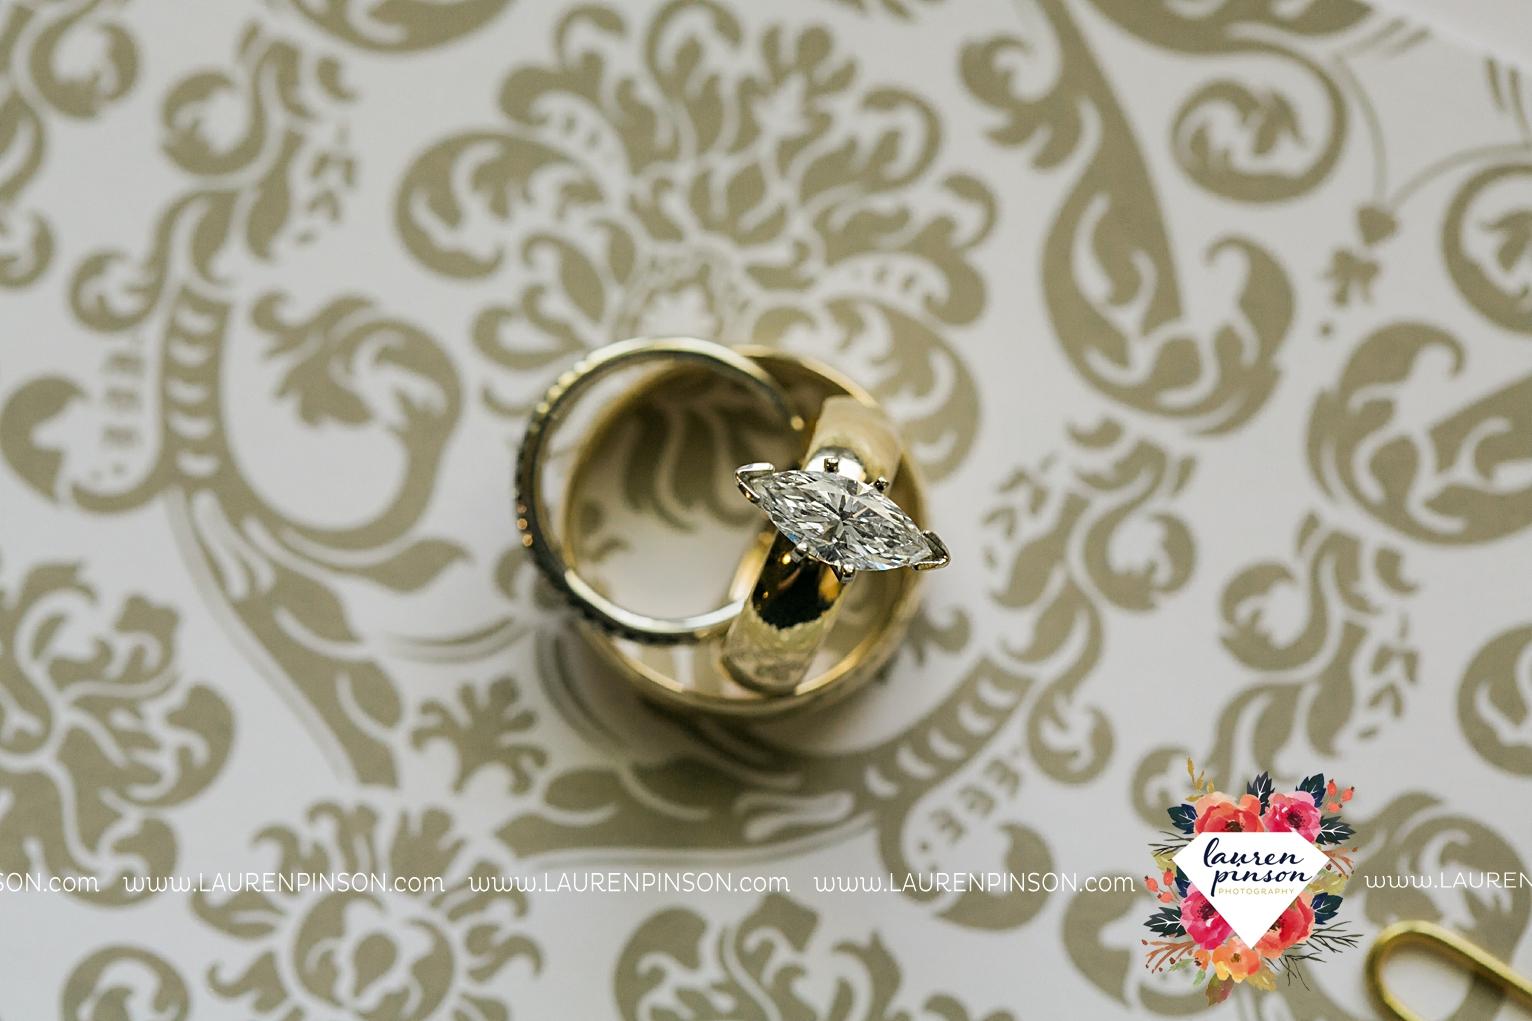 wichita-falls-texas-wedding-photographer-the-forum-by-the-kemp-mayfield-events-ulta-gold-glitter_2805.jpg